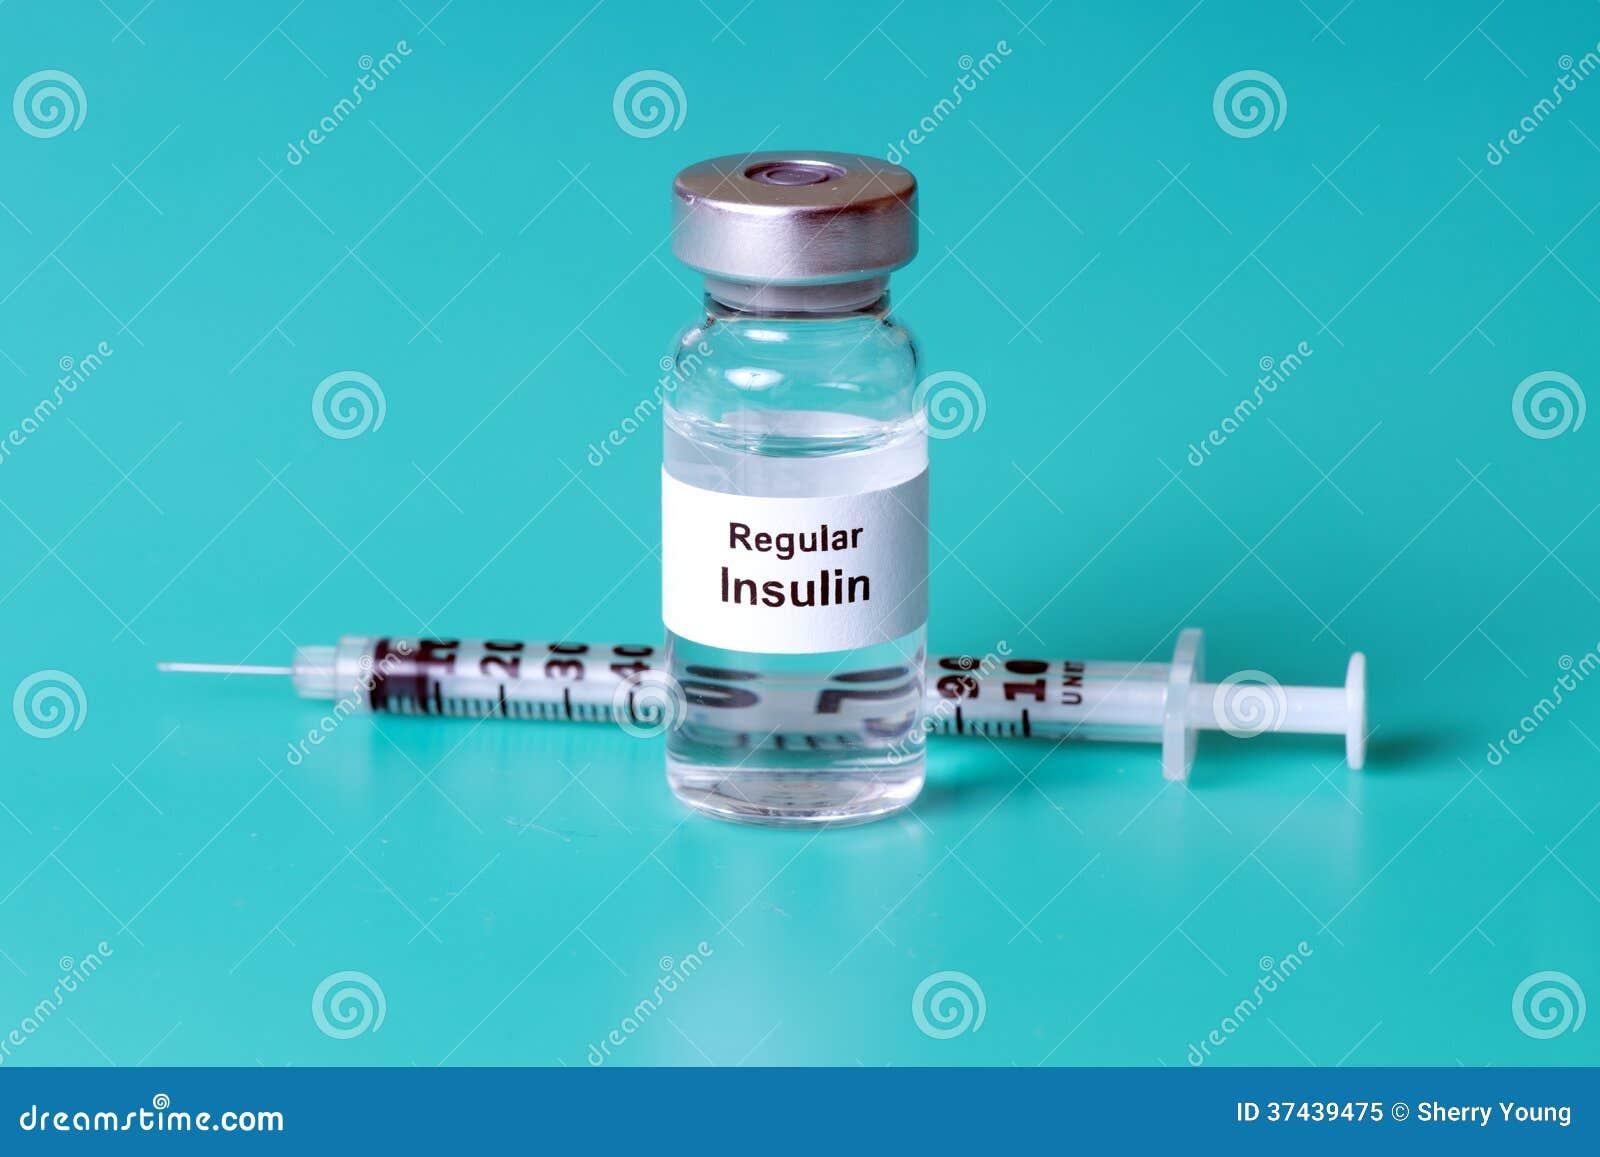 Regular Insulin Royalty Free Stock Photo - Image: 37439475